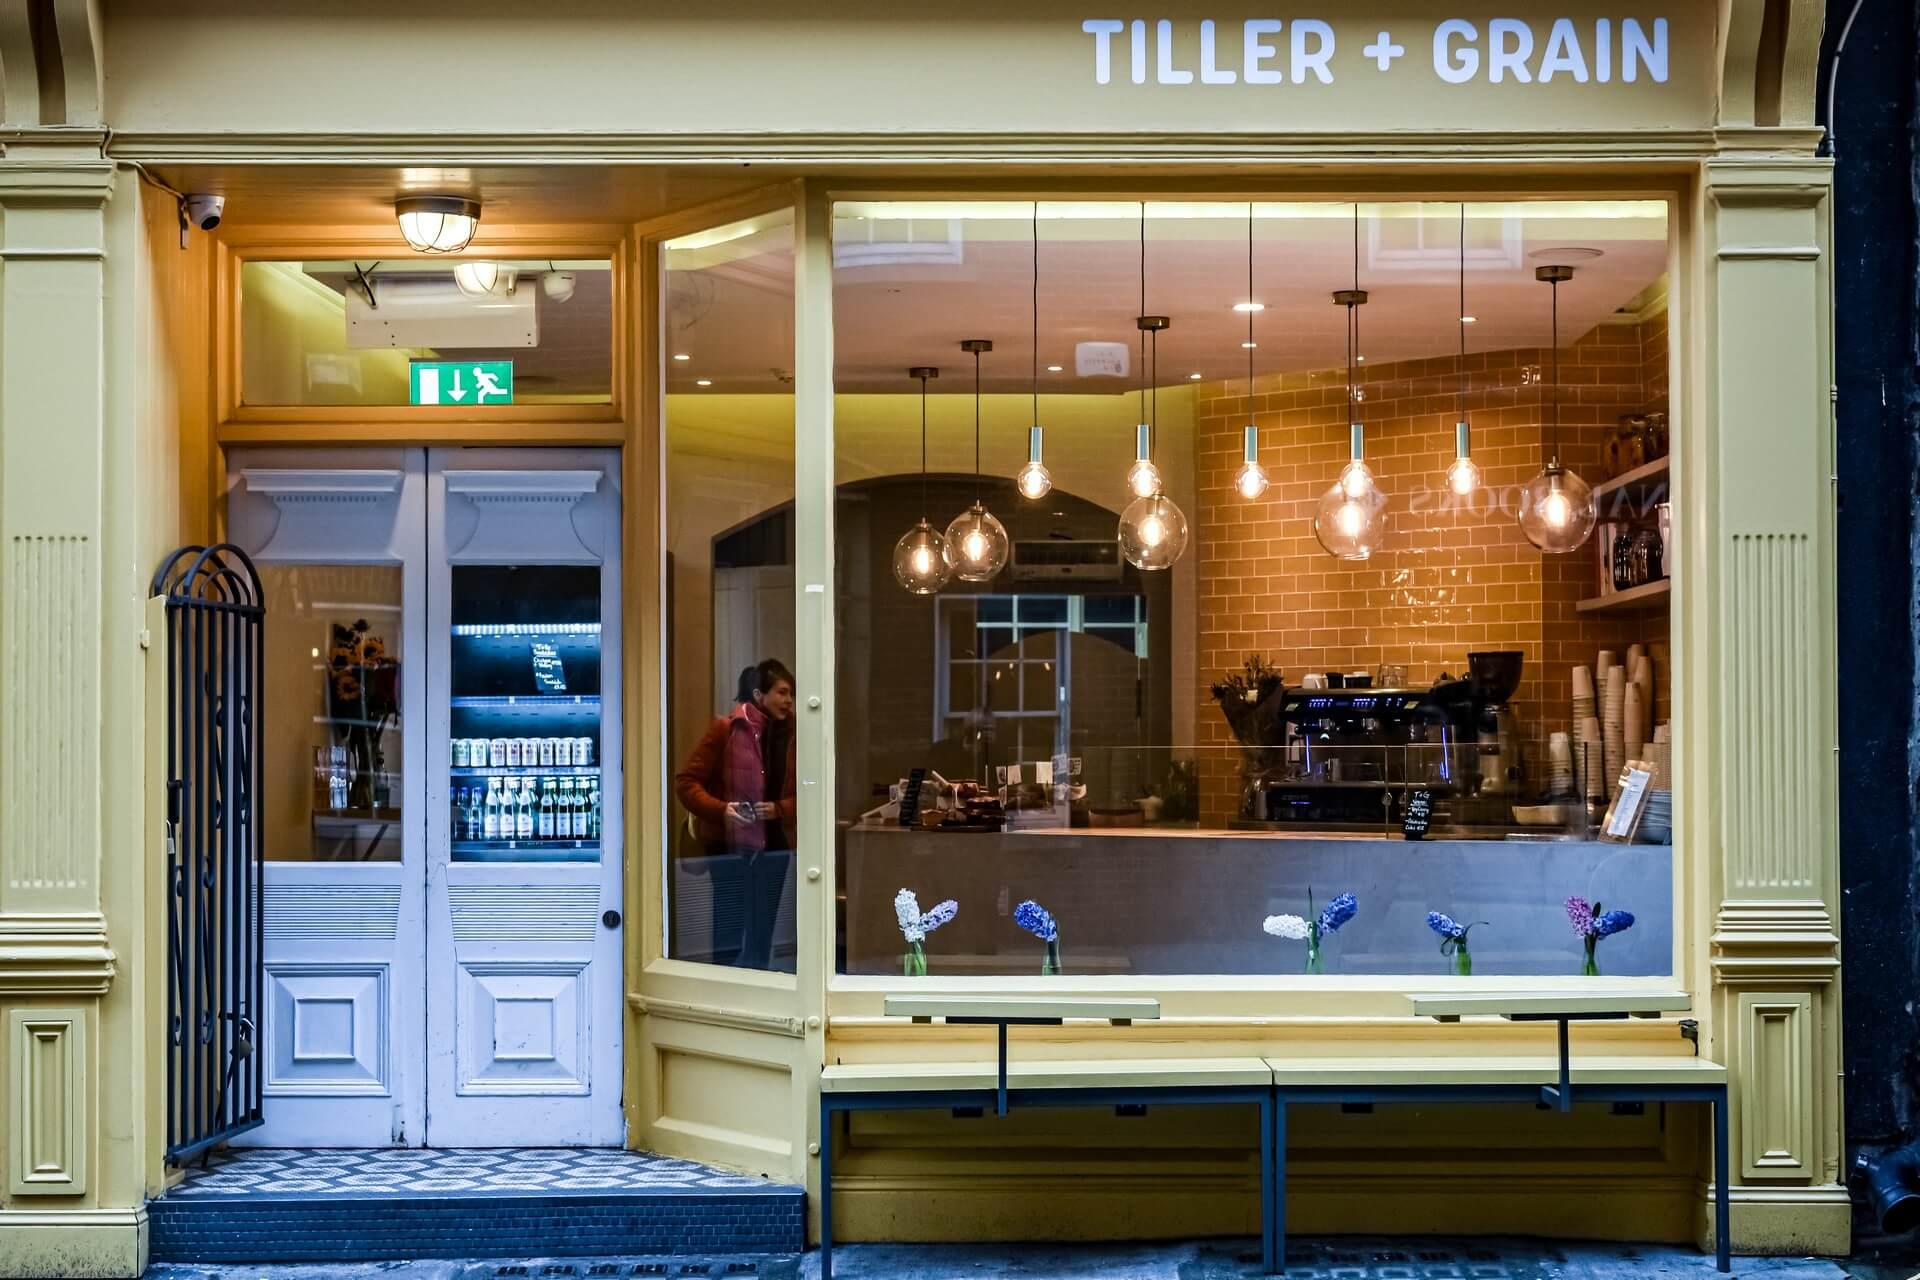 Tiller & Grain